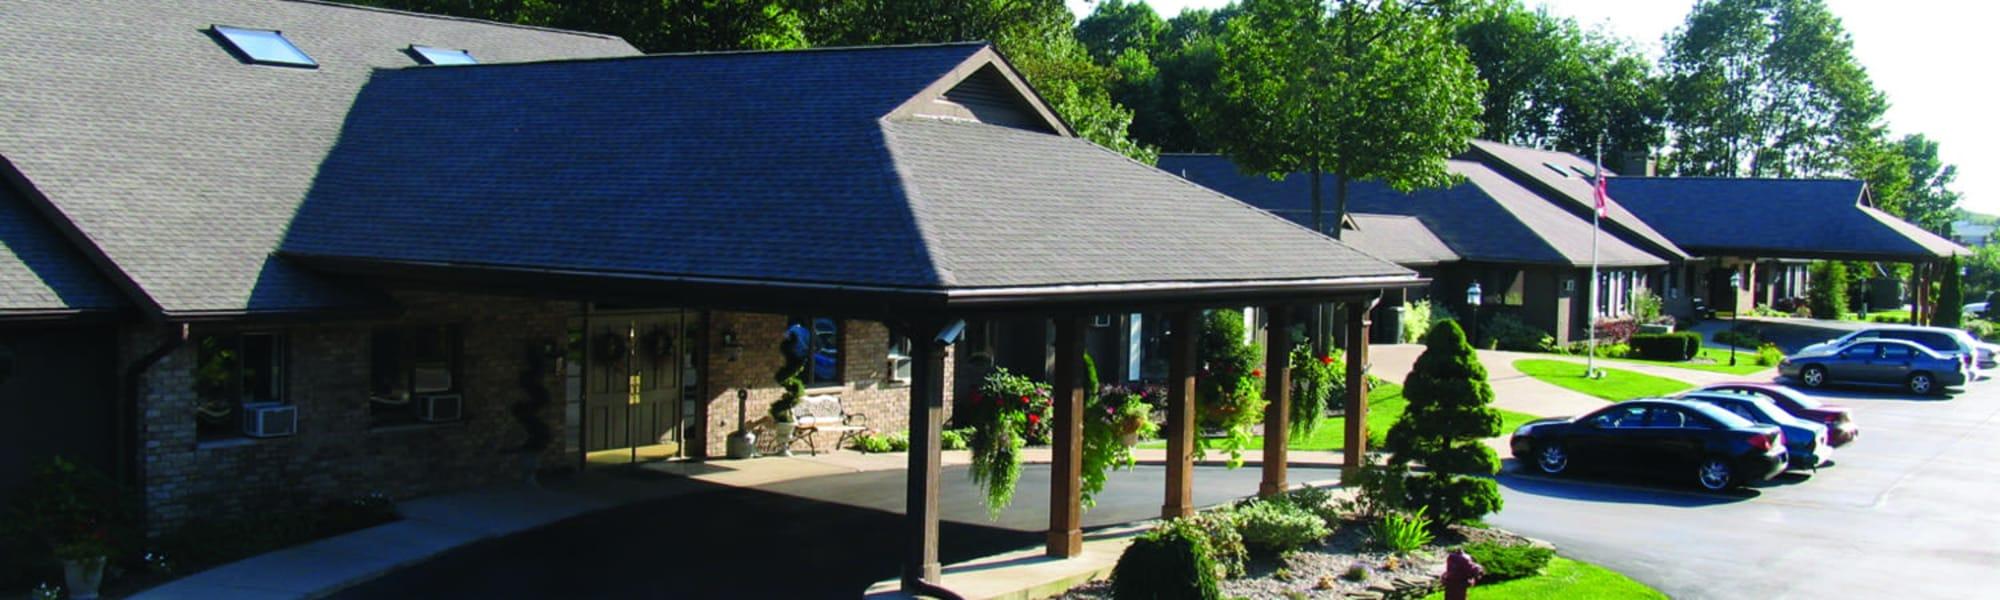 Photo Gallery at Lakeshore Woods in Fort Gratiot, Michigan